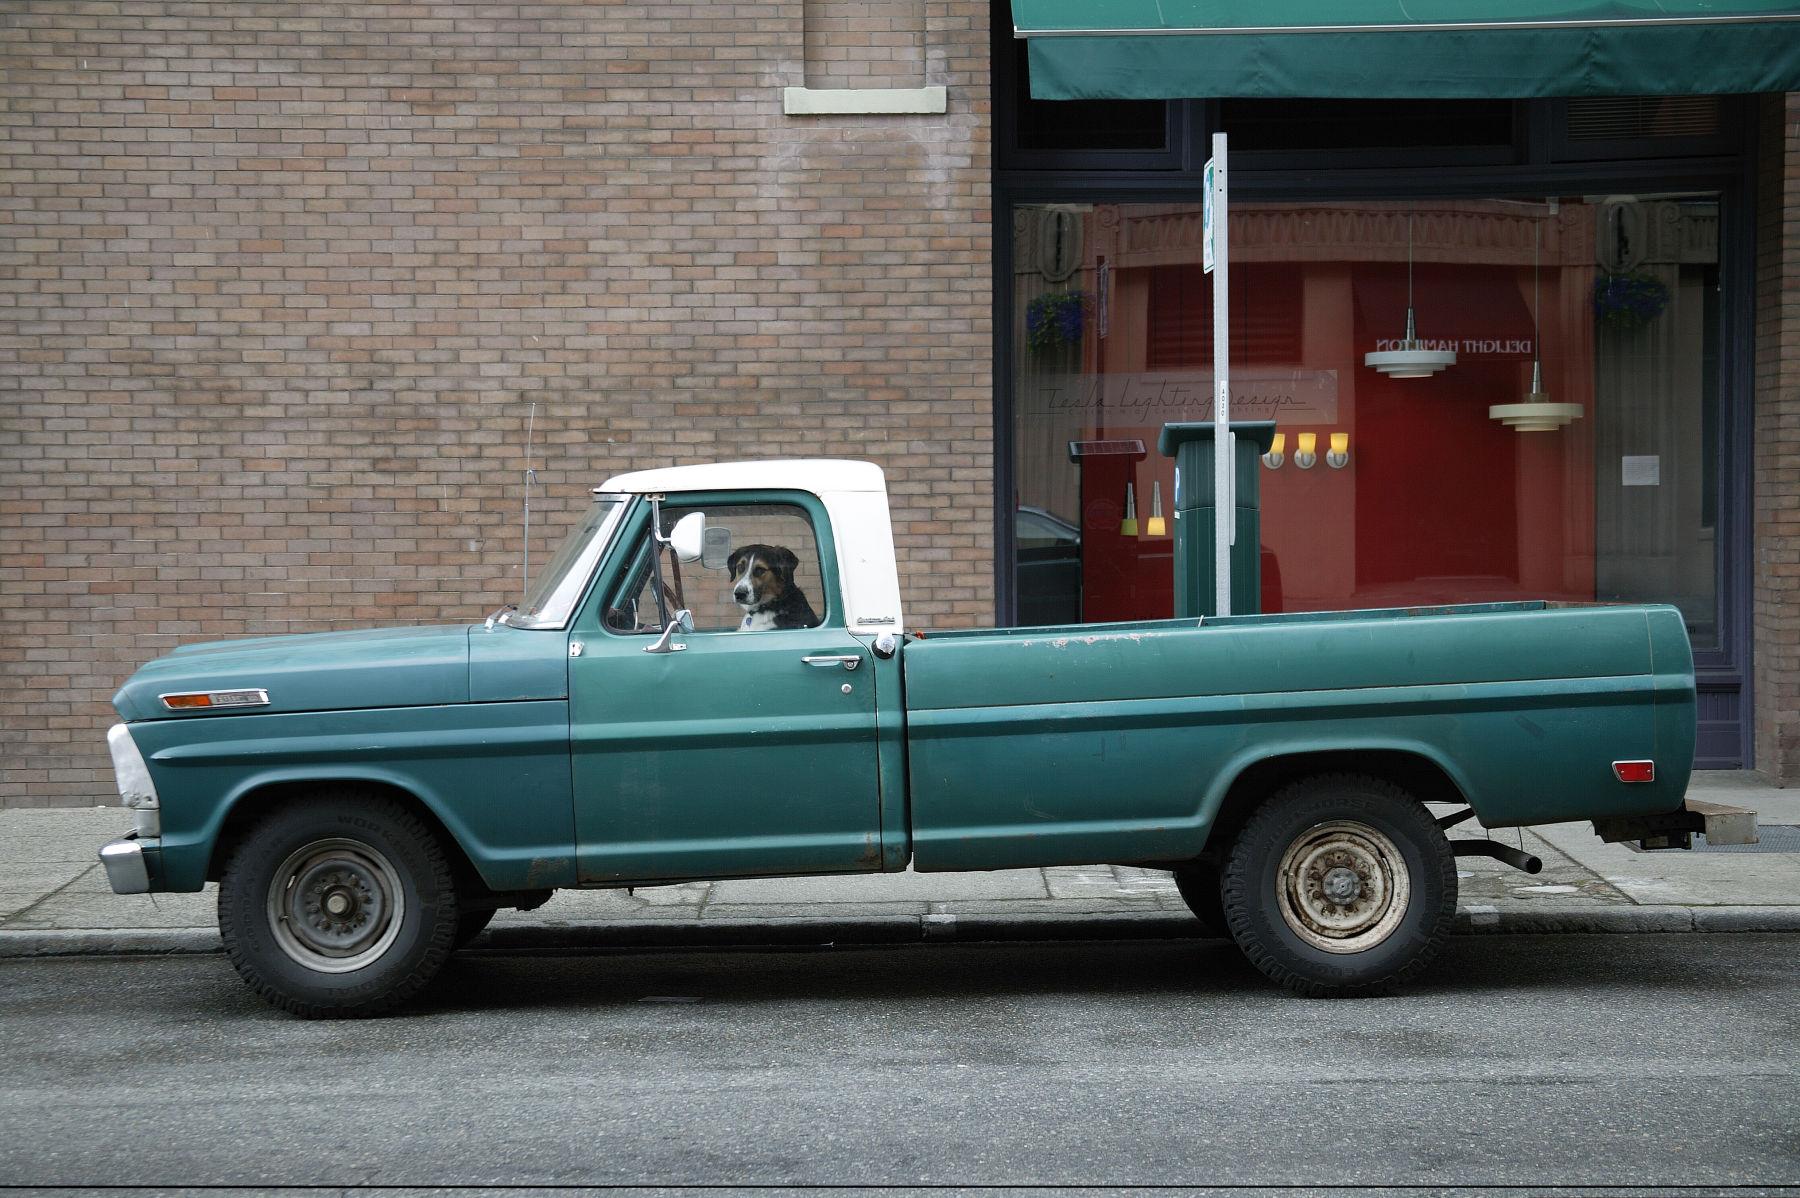 5_1dog_his_truck.jpg